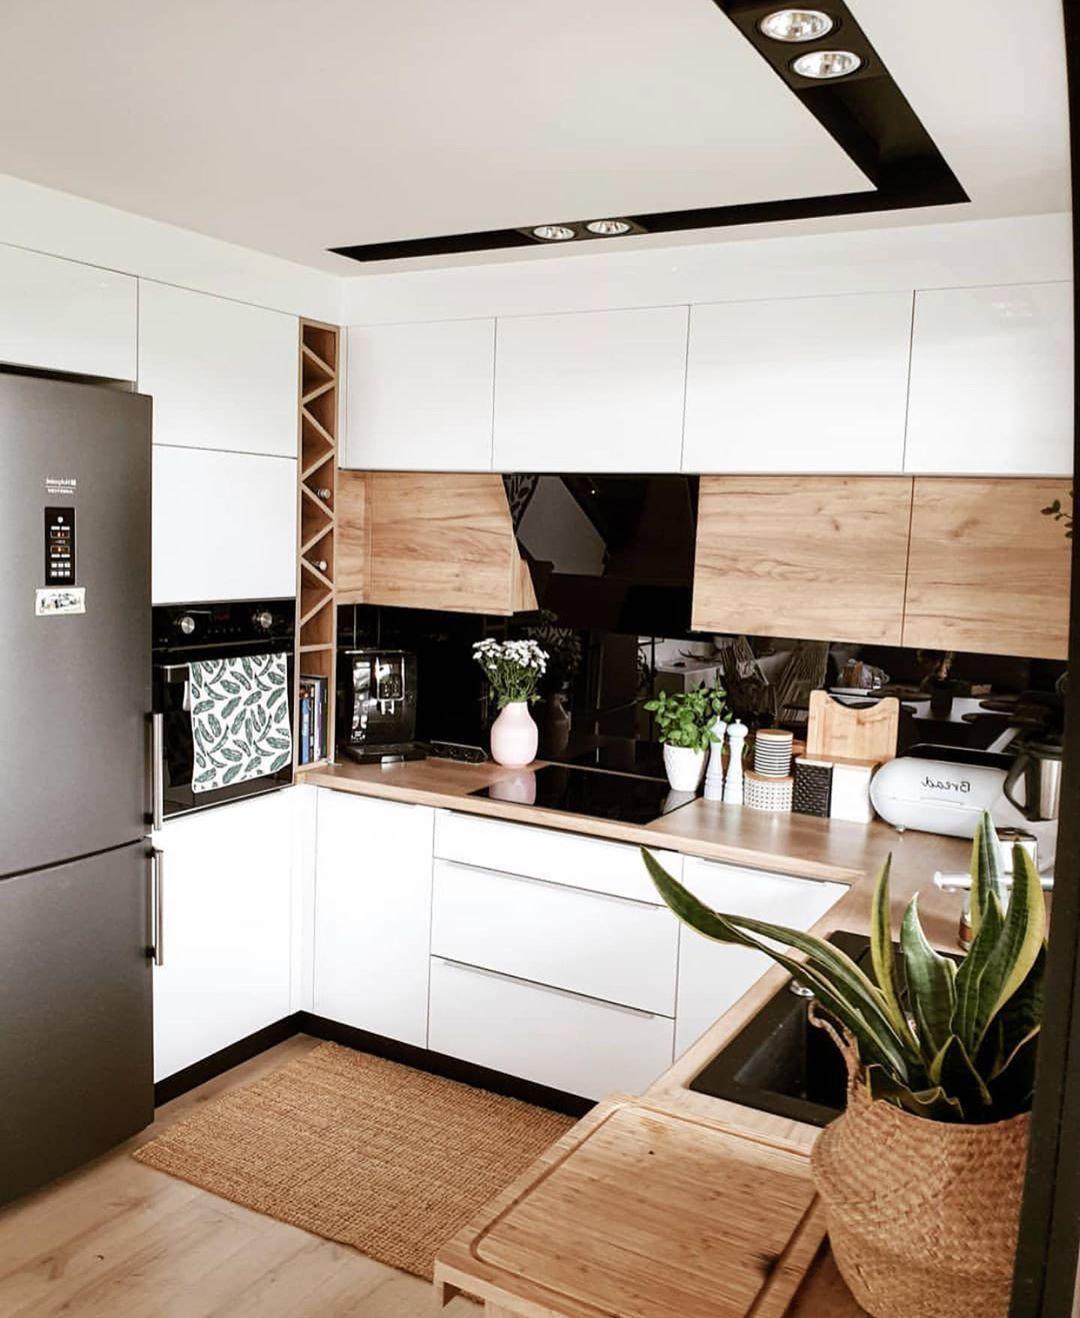 "Inspi_Deco on Instagram: ""️ Kitchen decor � � Inspi @my_hygge_my_home #picoftheday #instalike #kitchen #kitchendesign #kitchendecor #kitchenview #homedecor…"""